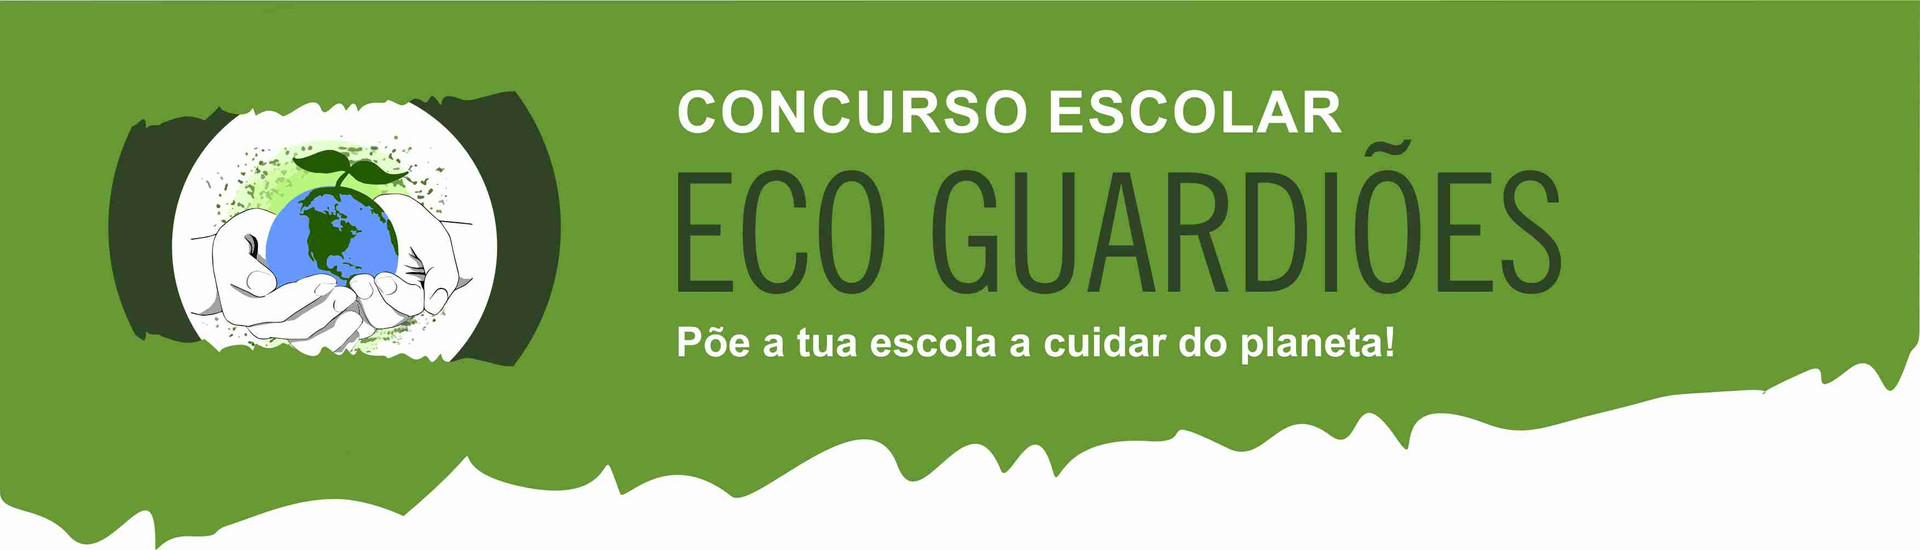 Ecoguardioes_2020_cabeçalho.jpg